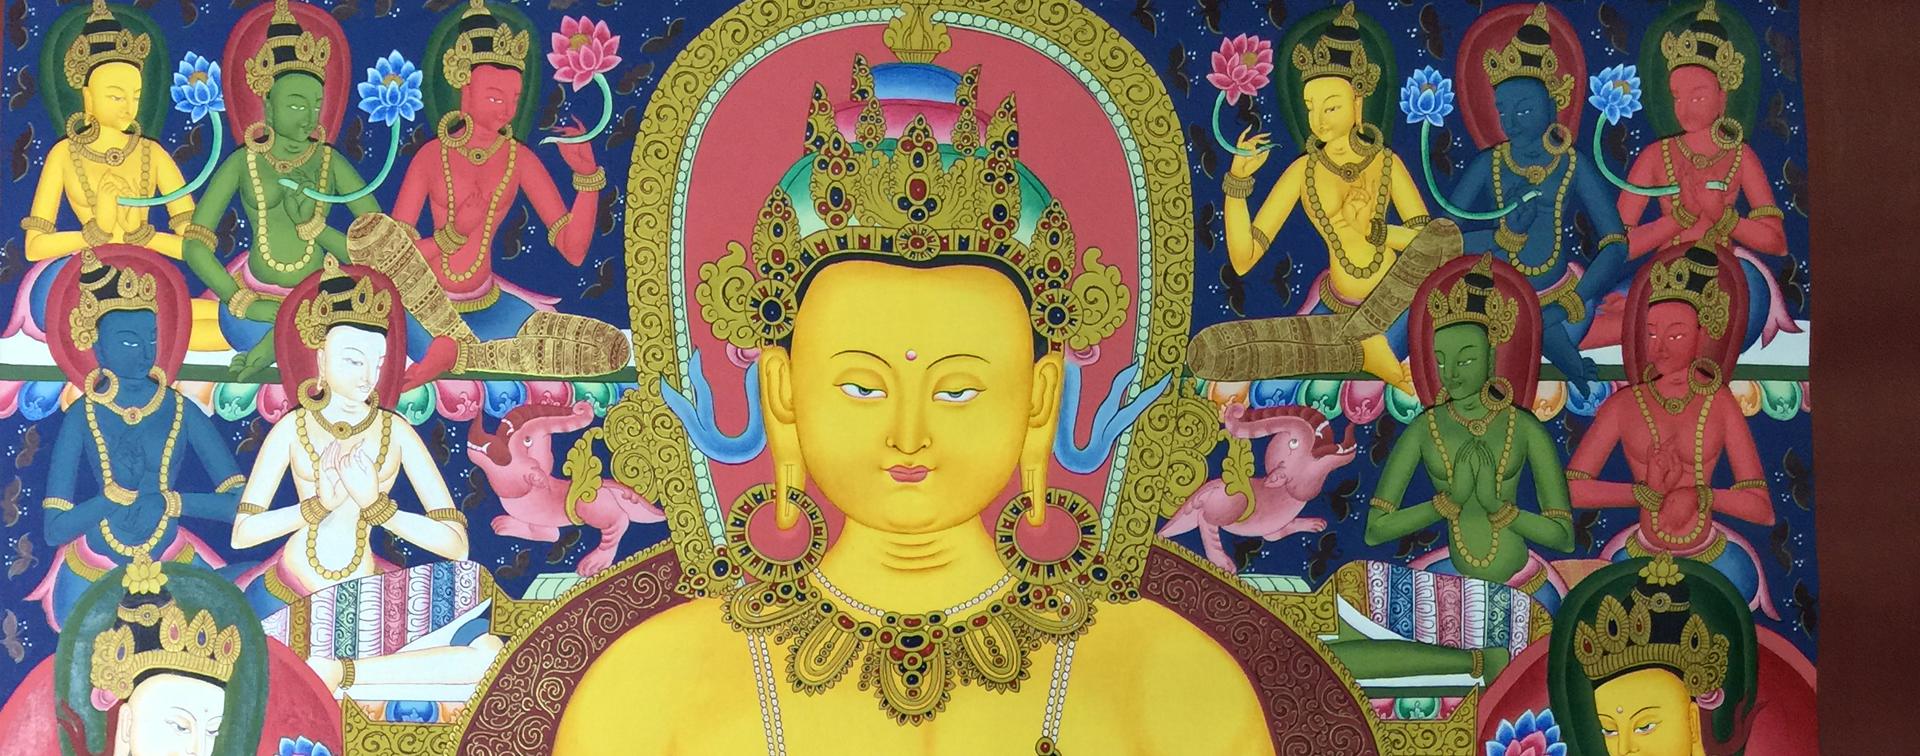 Shakyamui Buddha Thangka